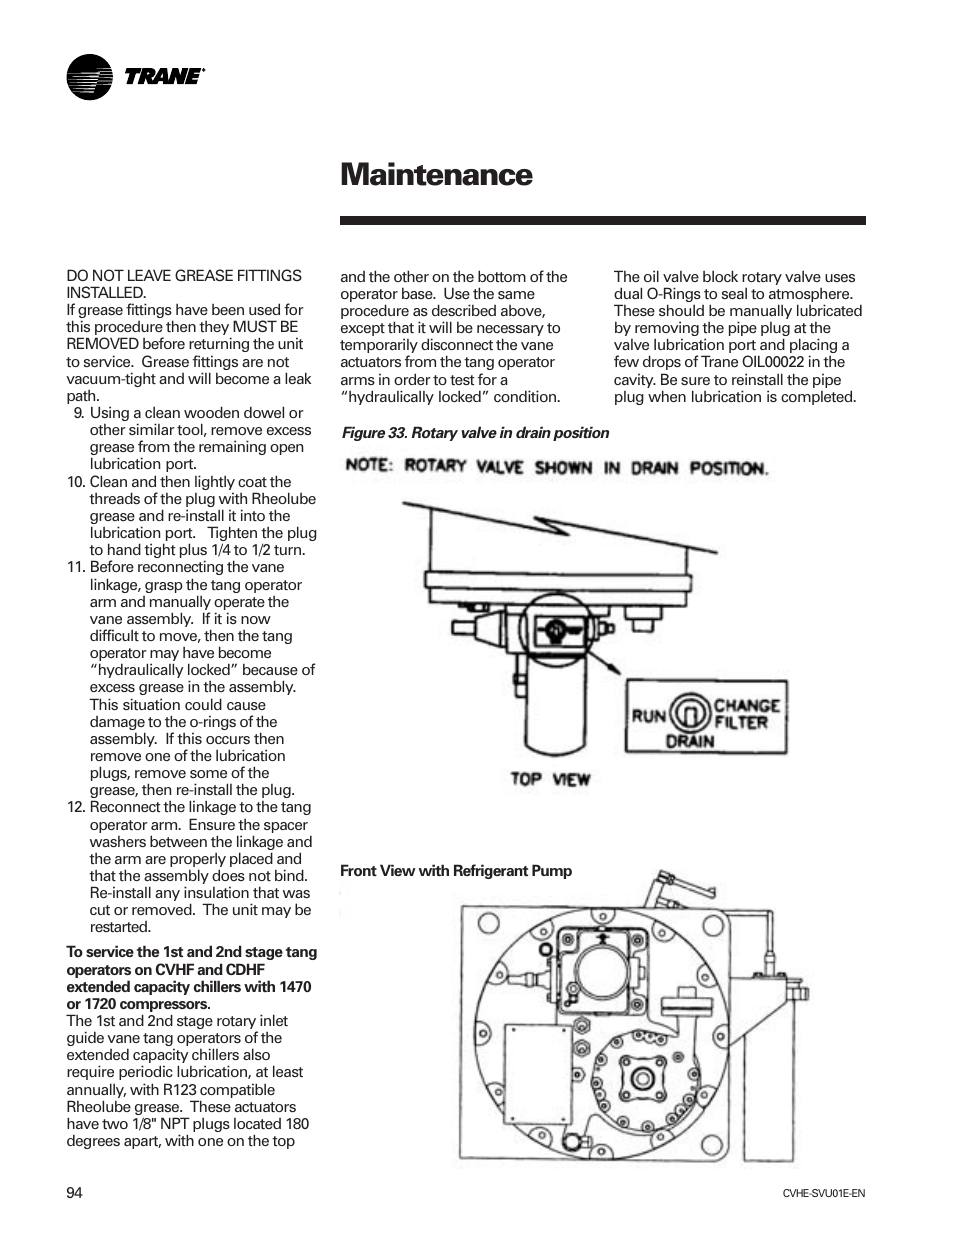 maintenance trane cvhe svu01e enx39640712050 user manual page 94 rh manualsdir com Trane Water Chillers Trane Water Chillers